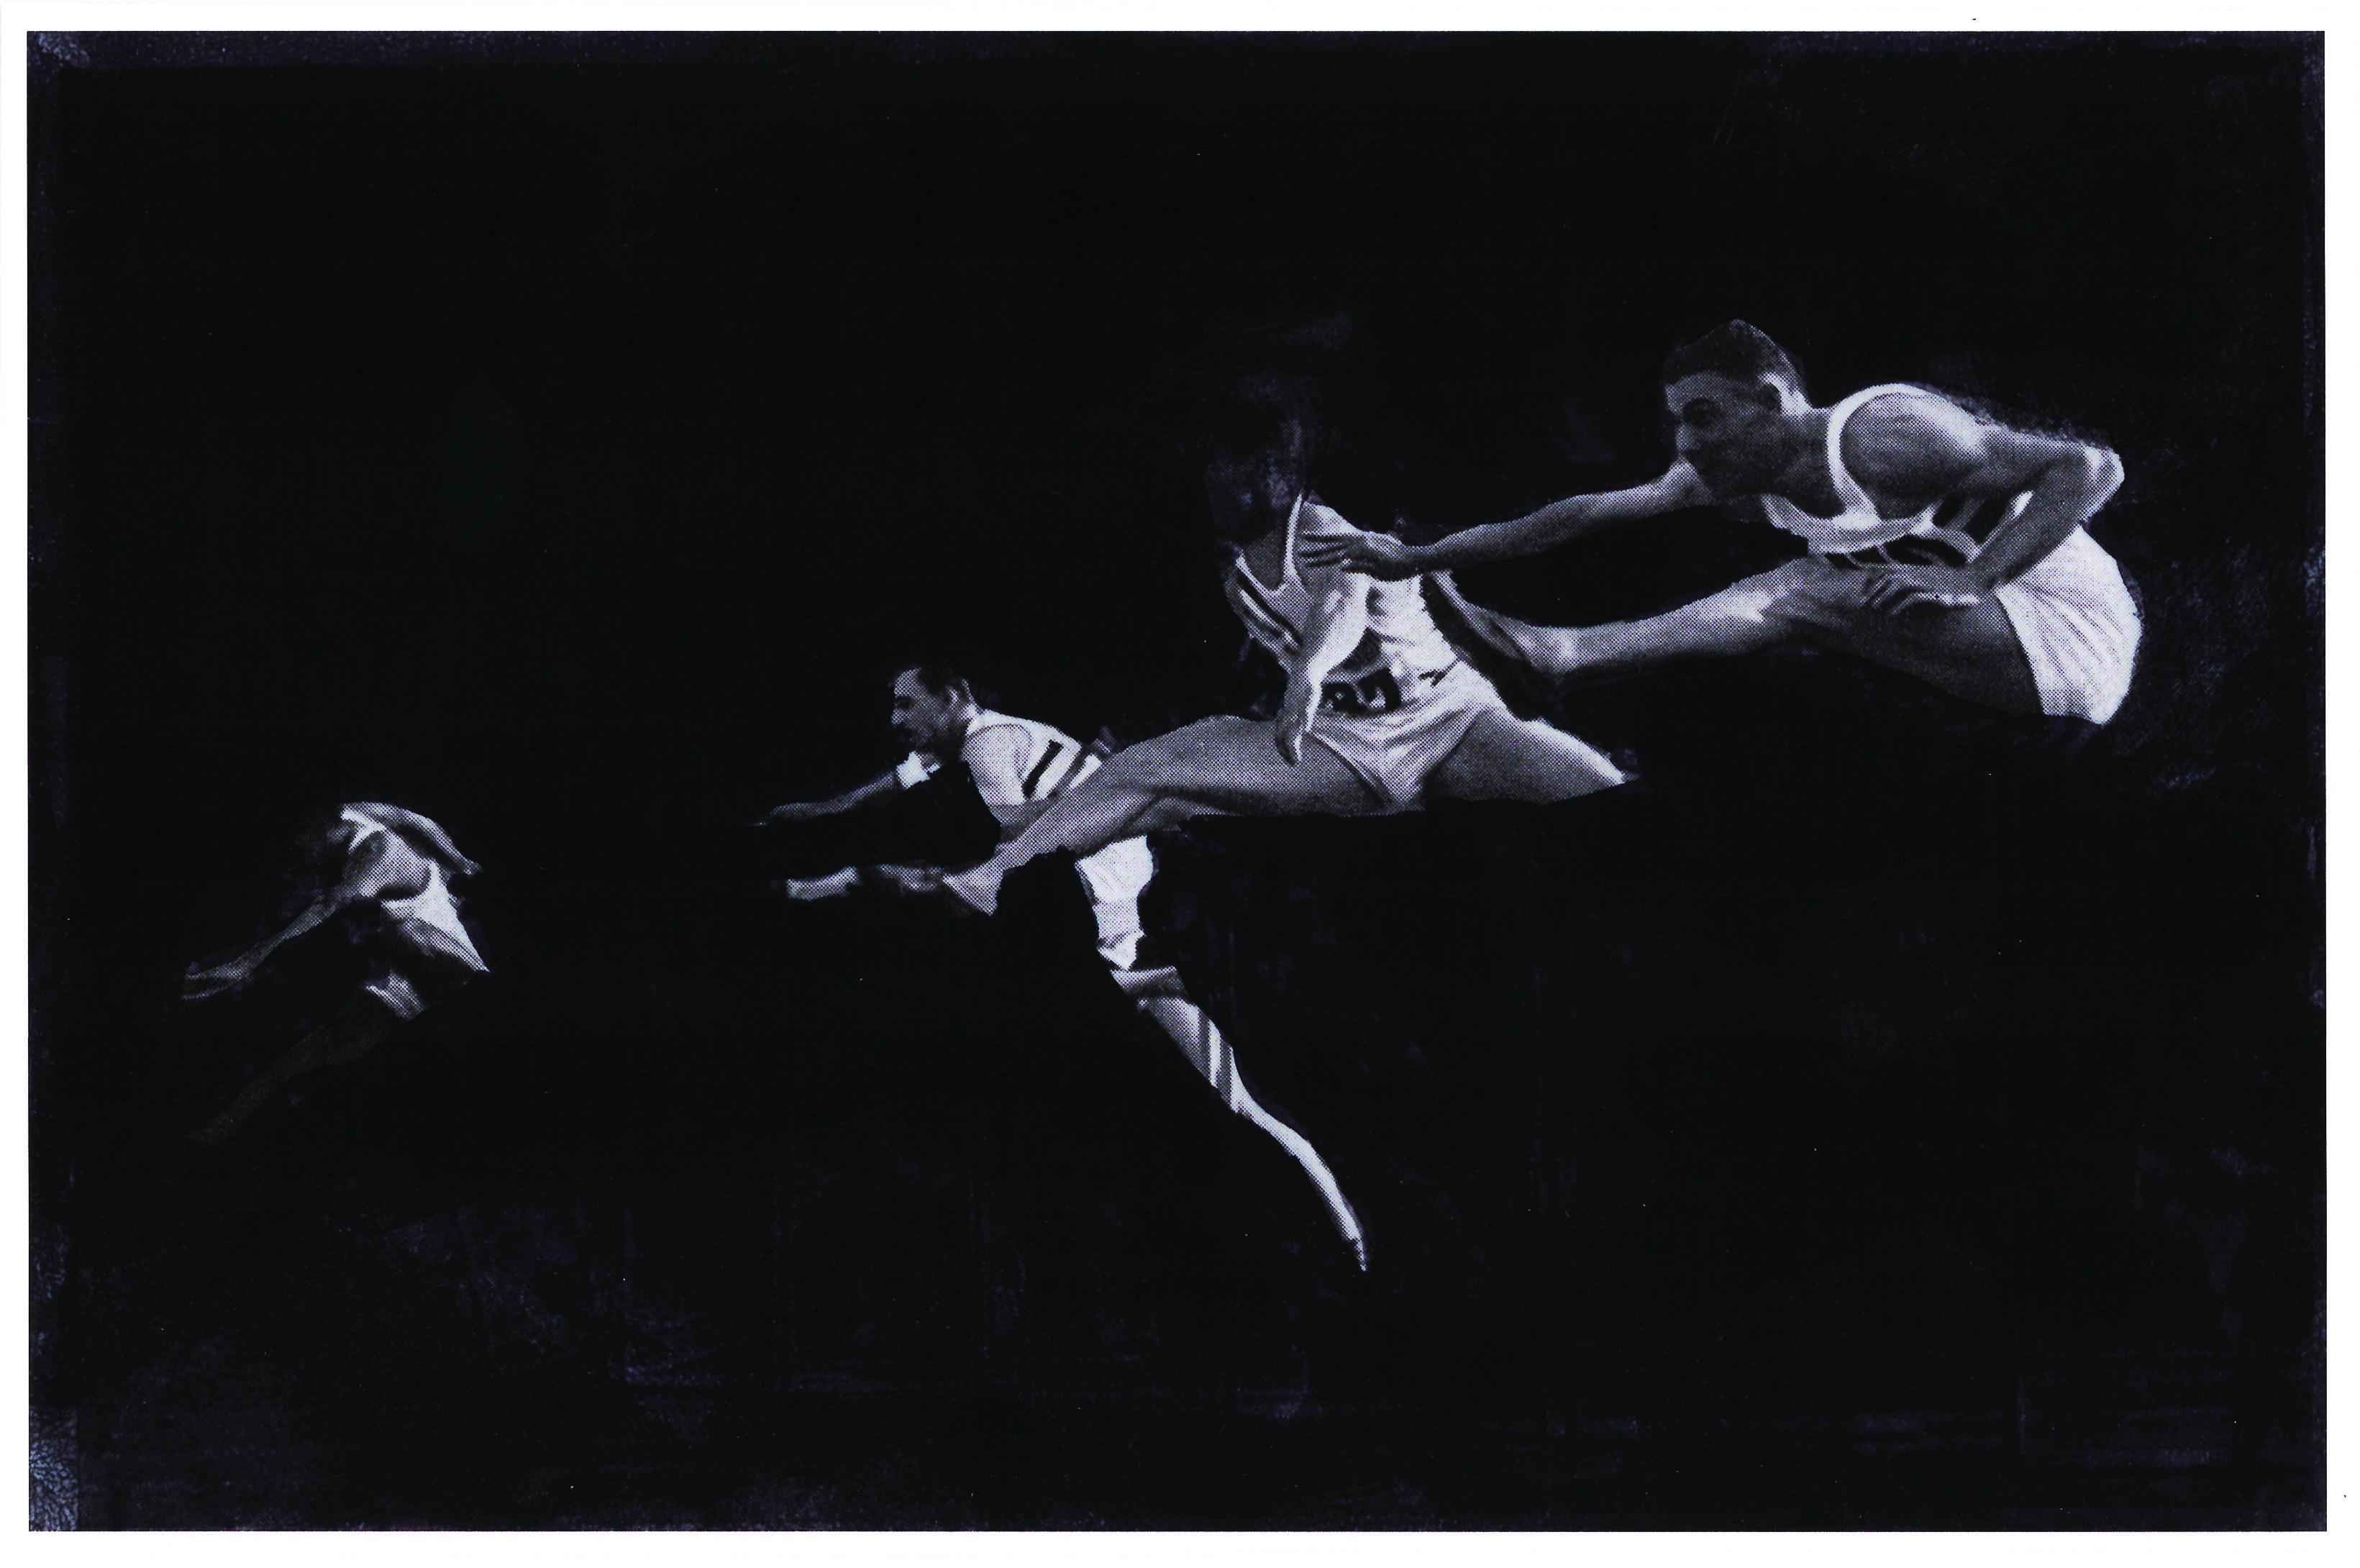 bez tytułu, 2011